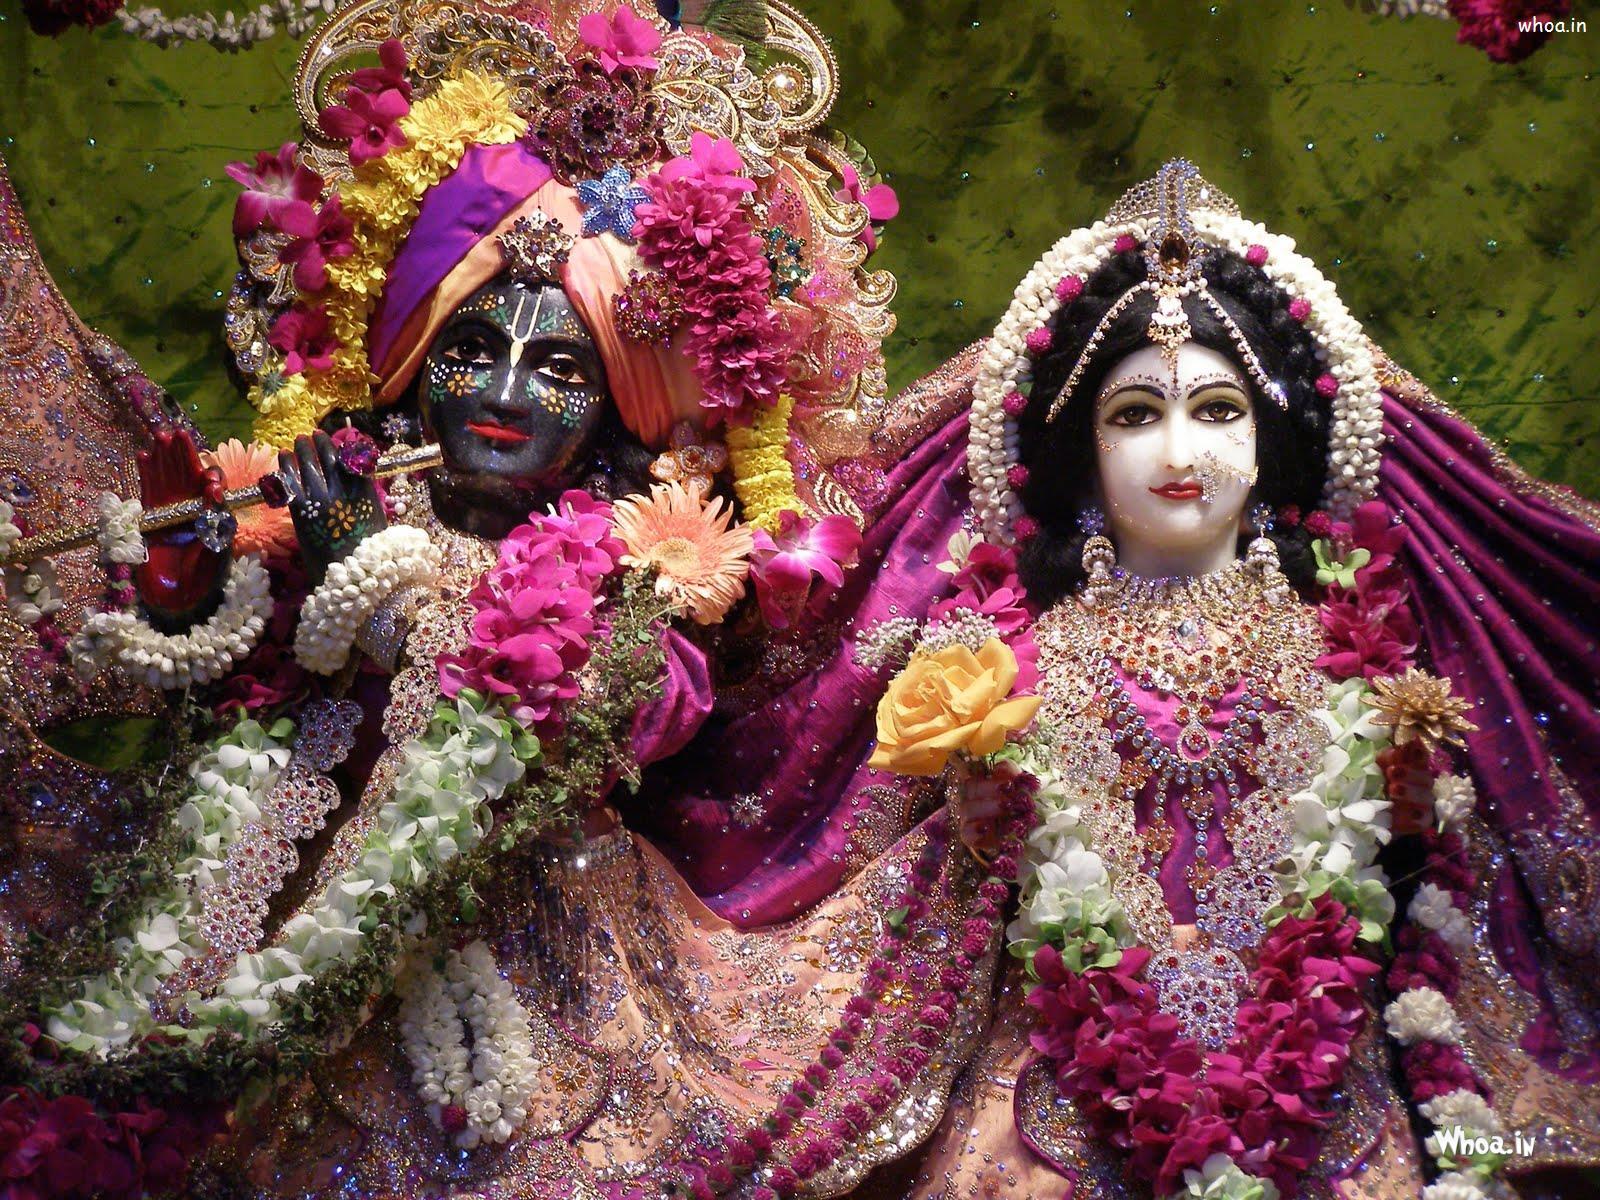 Cool Wallpaper Lord Radha Krishna - lord-radhe-krishna-statue-with-face-closer-hd-wallpaper  Best Photo Reference_624213.in/download/lord-radhe-krishna-statue-with-face-closer-hd-wallpaper